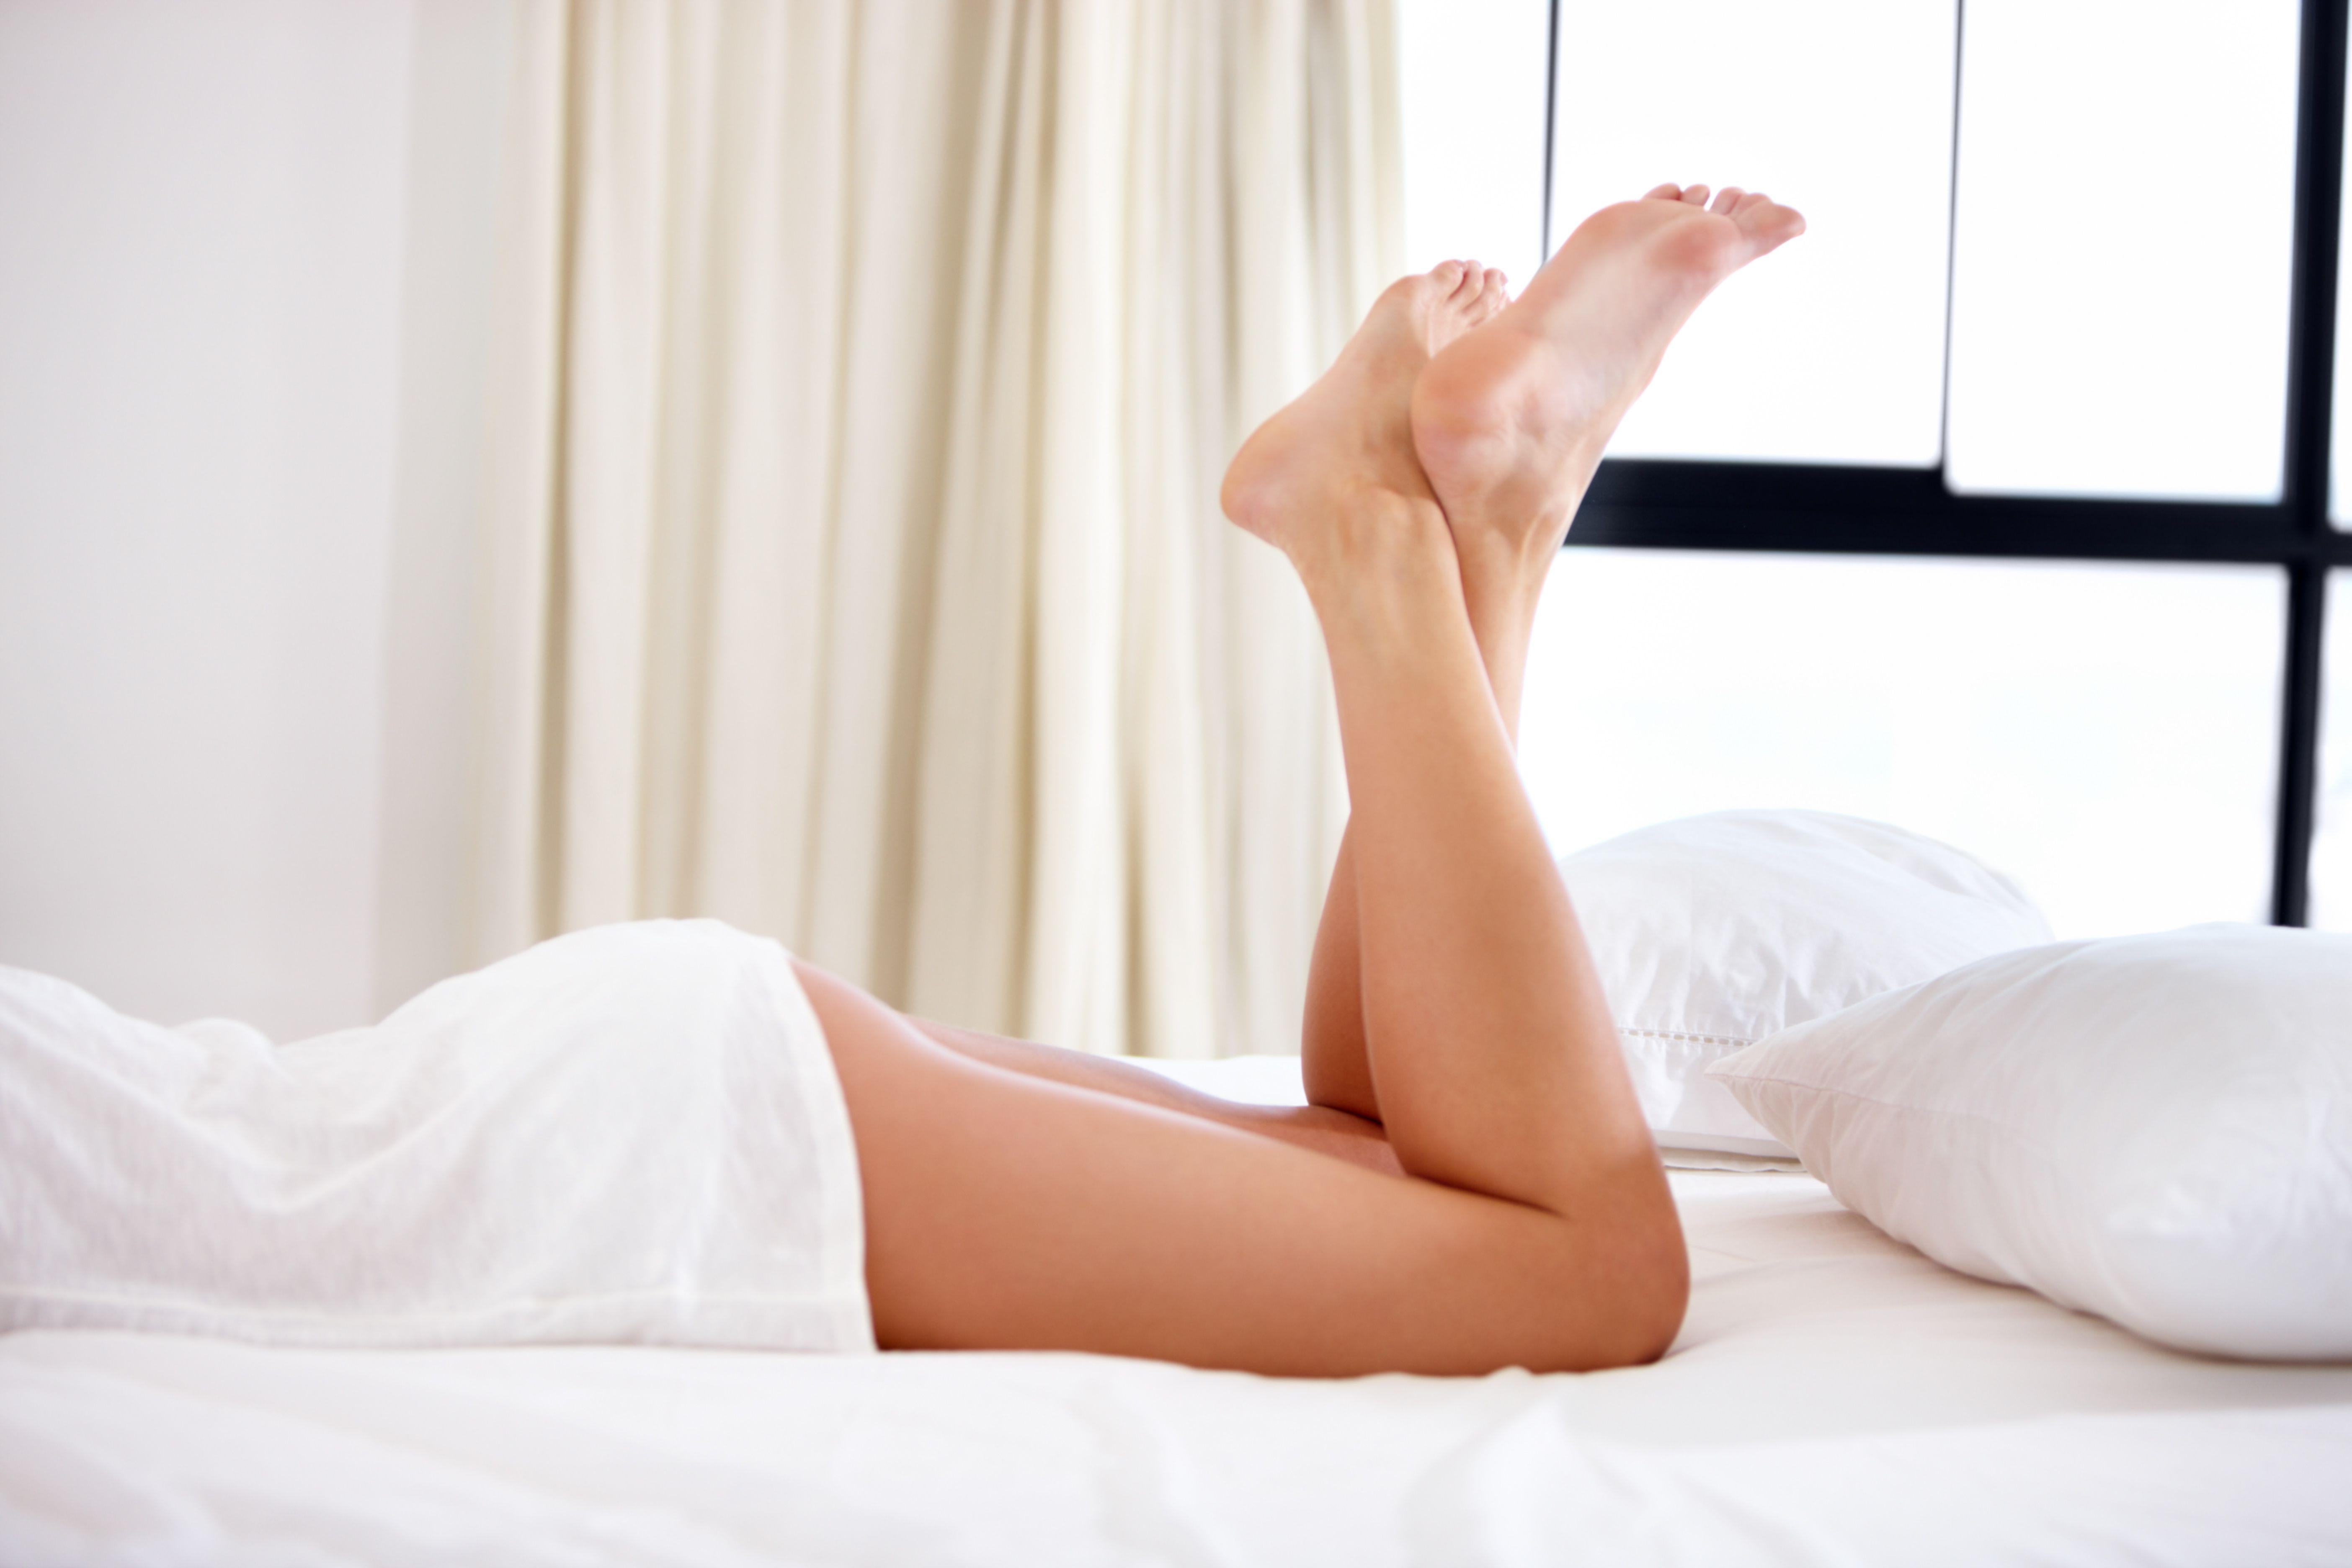 anal sex feces max b porno star